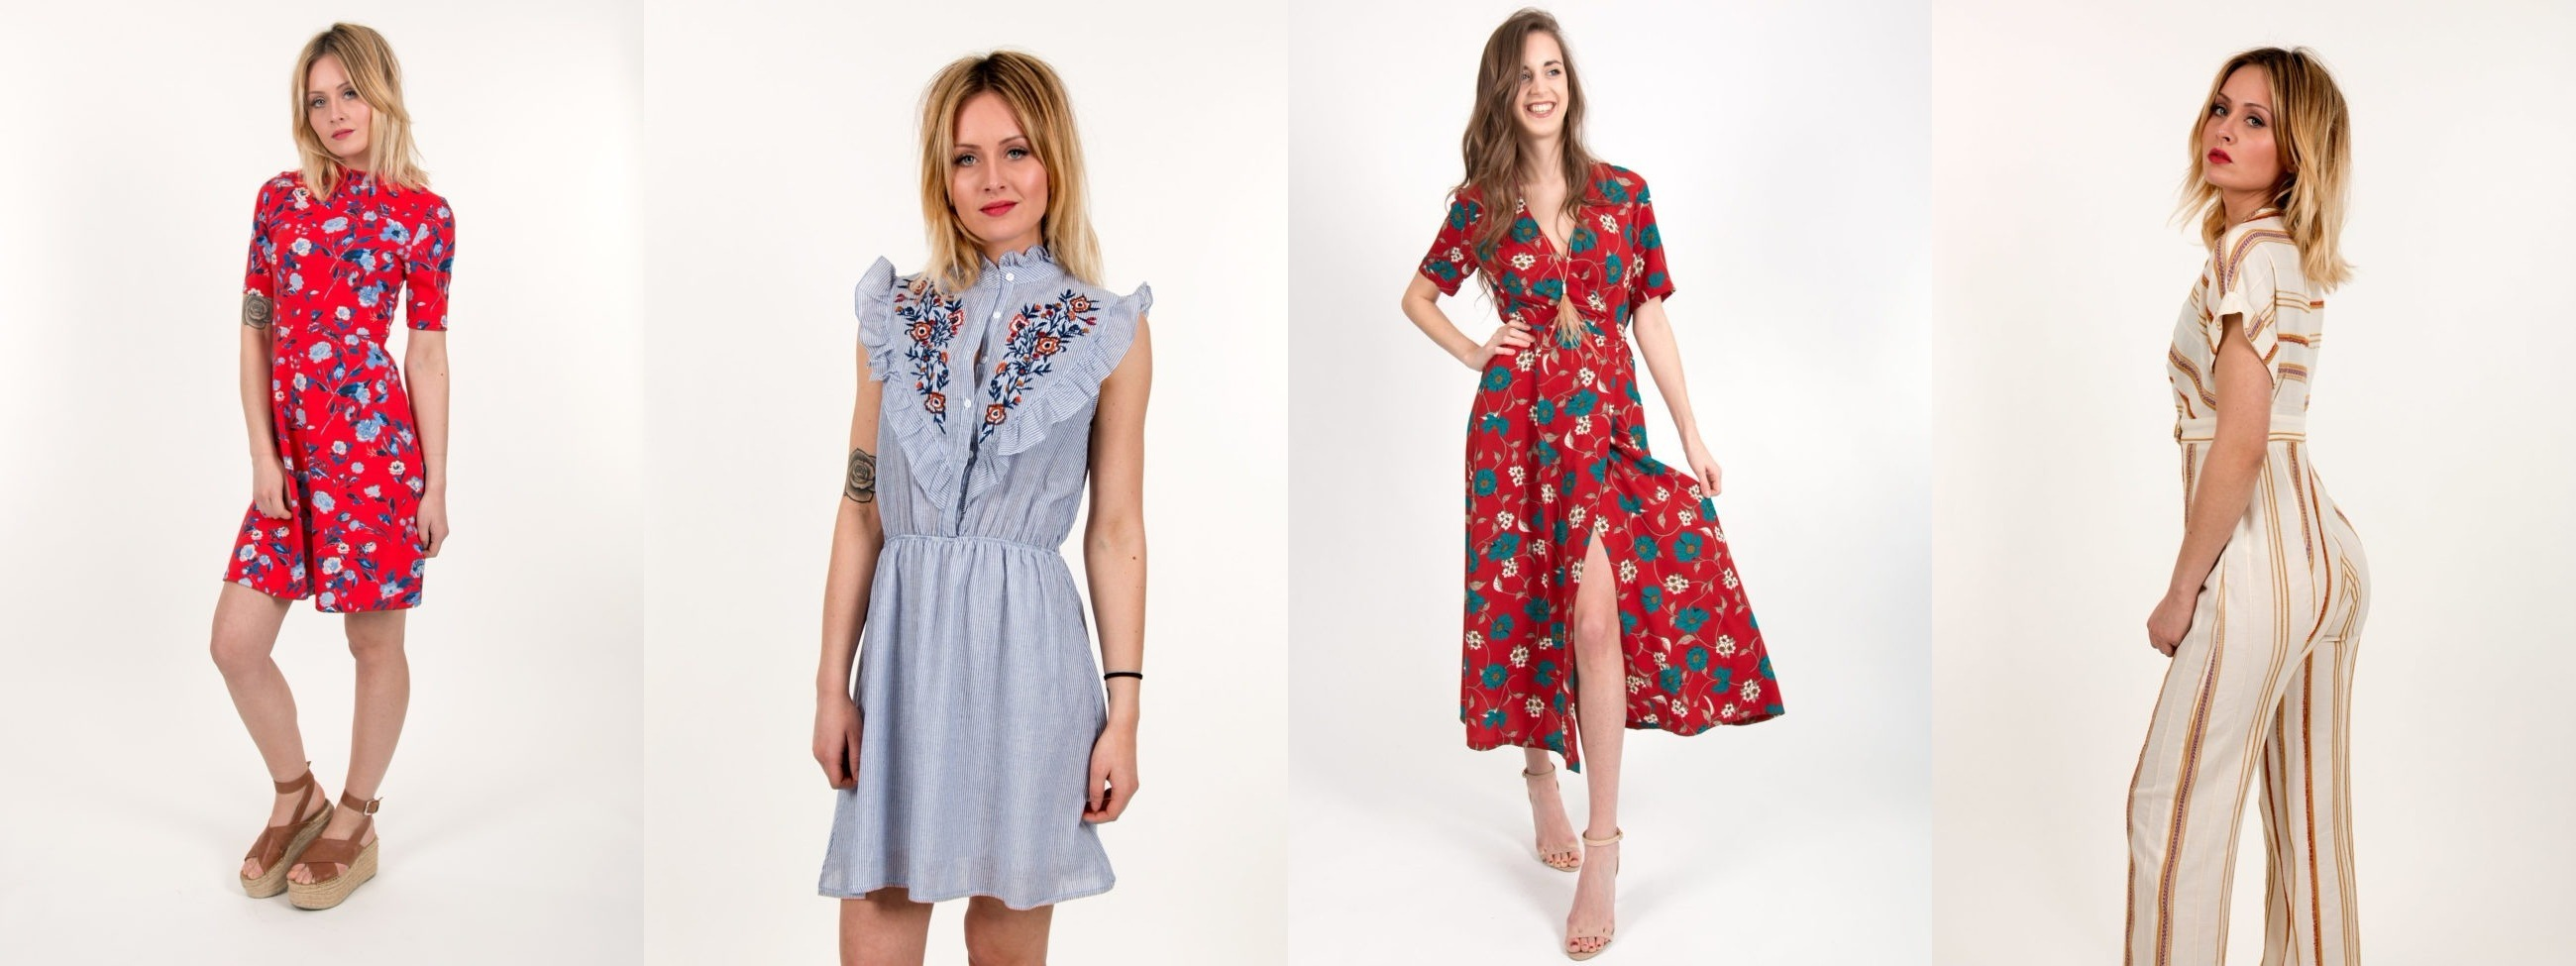 robes printemps Nowe store